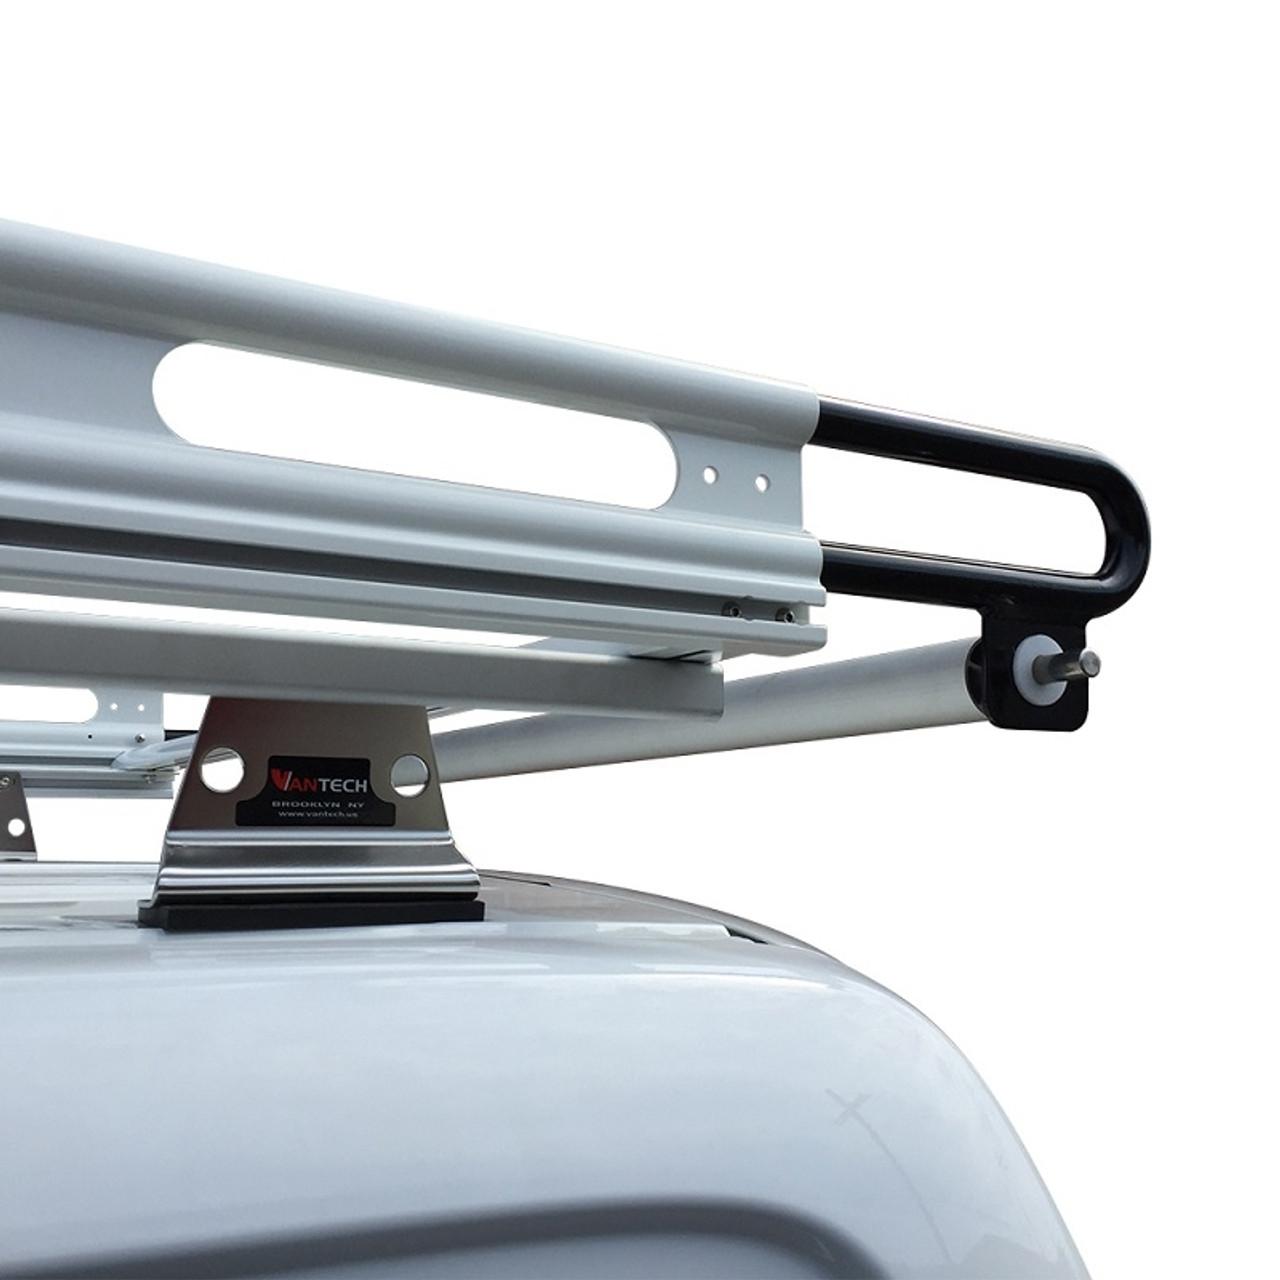 https leonardaccessories com product van ladder racks vantech h2 aluminum rack system ram promaster full size van